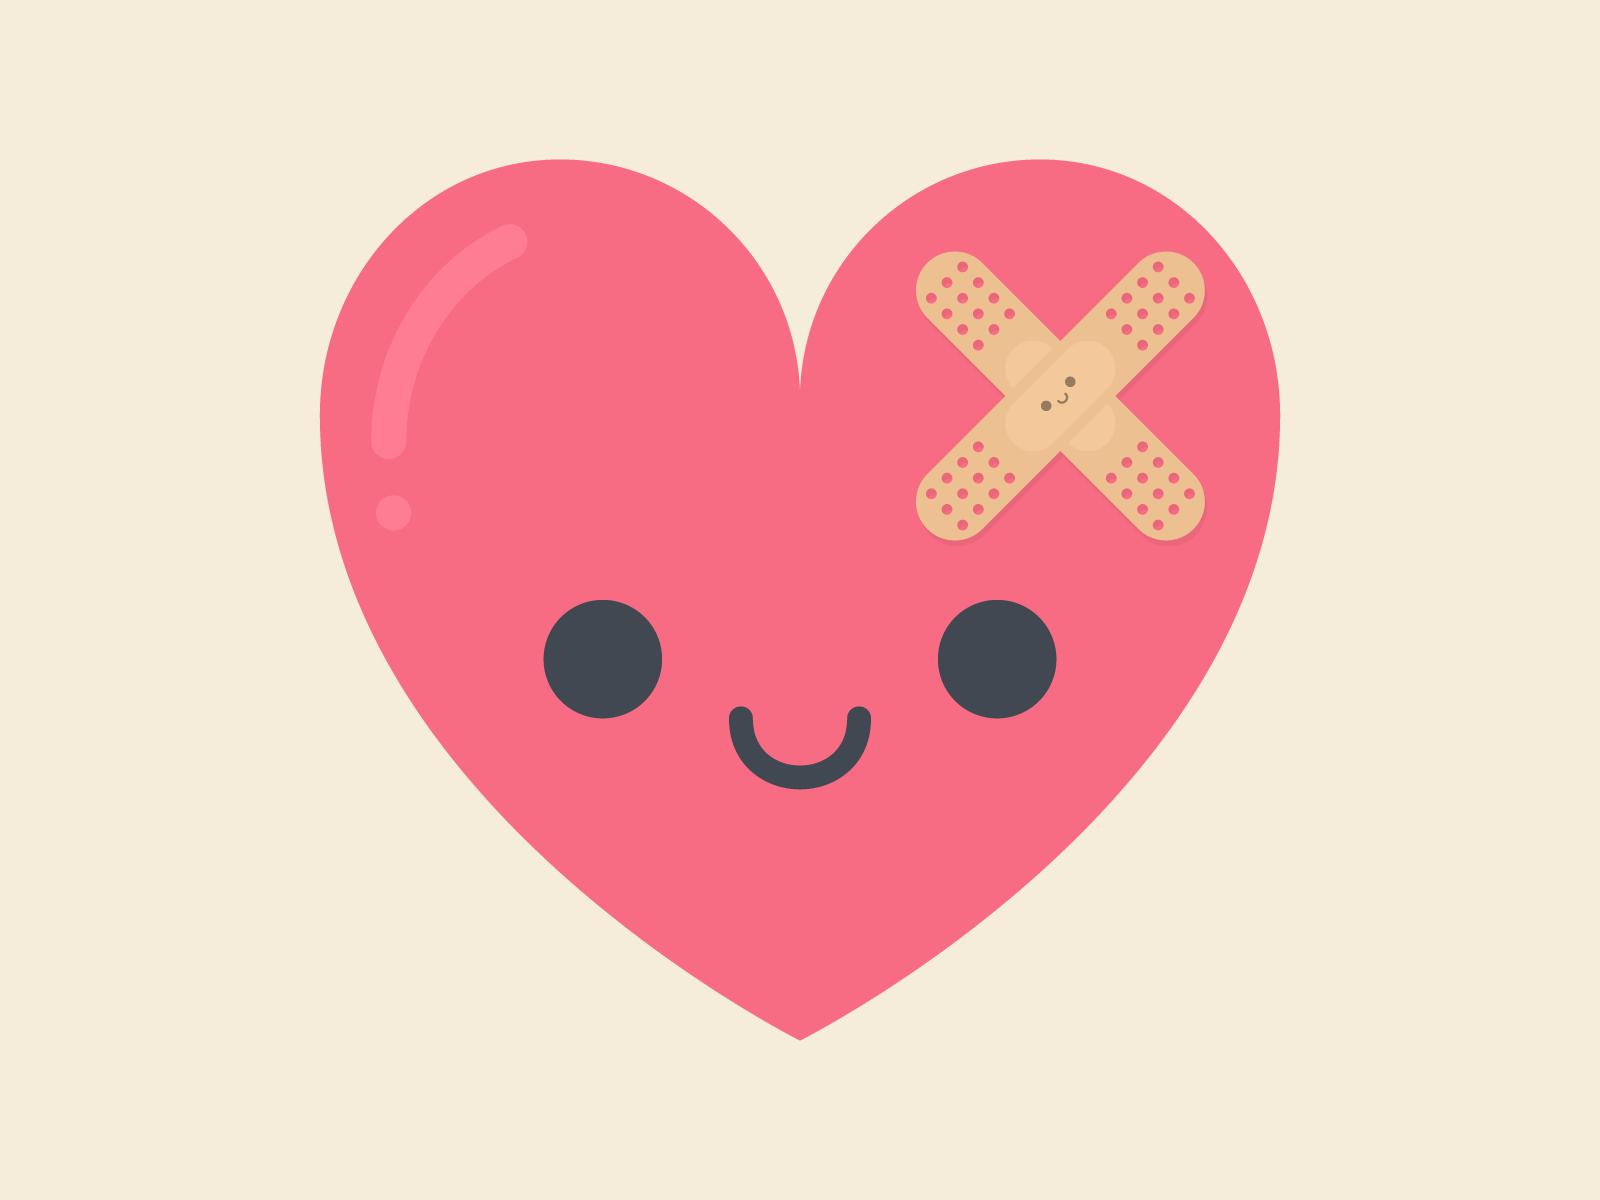 Cute Kawaii Healing Heart